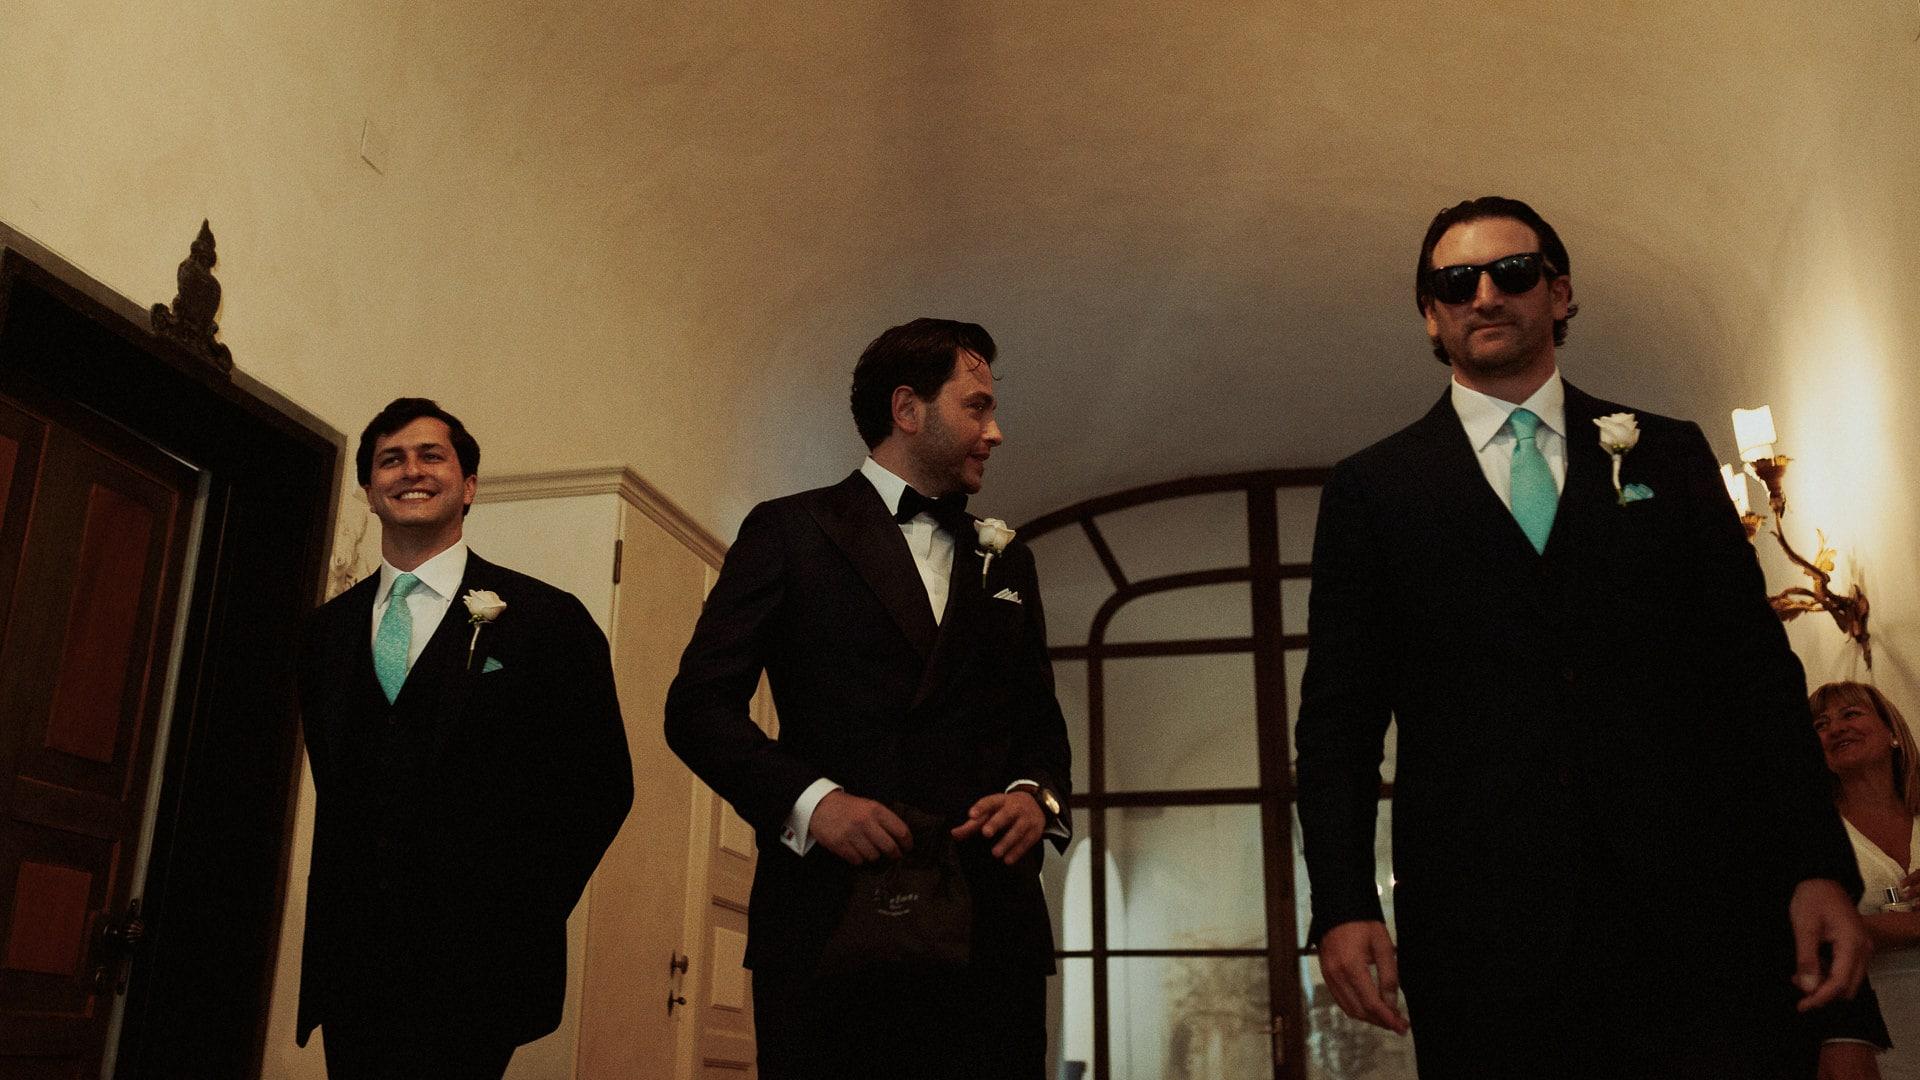 Portofino Destination Wedding Photographer Italy 0008